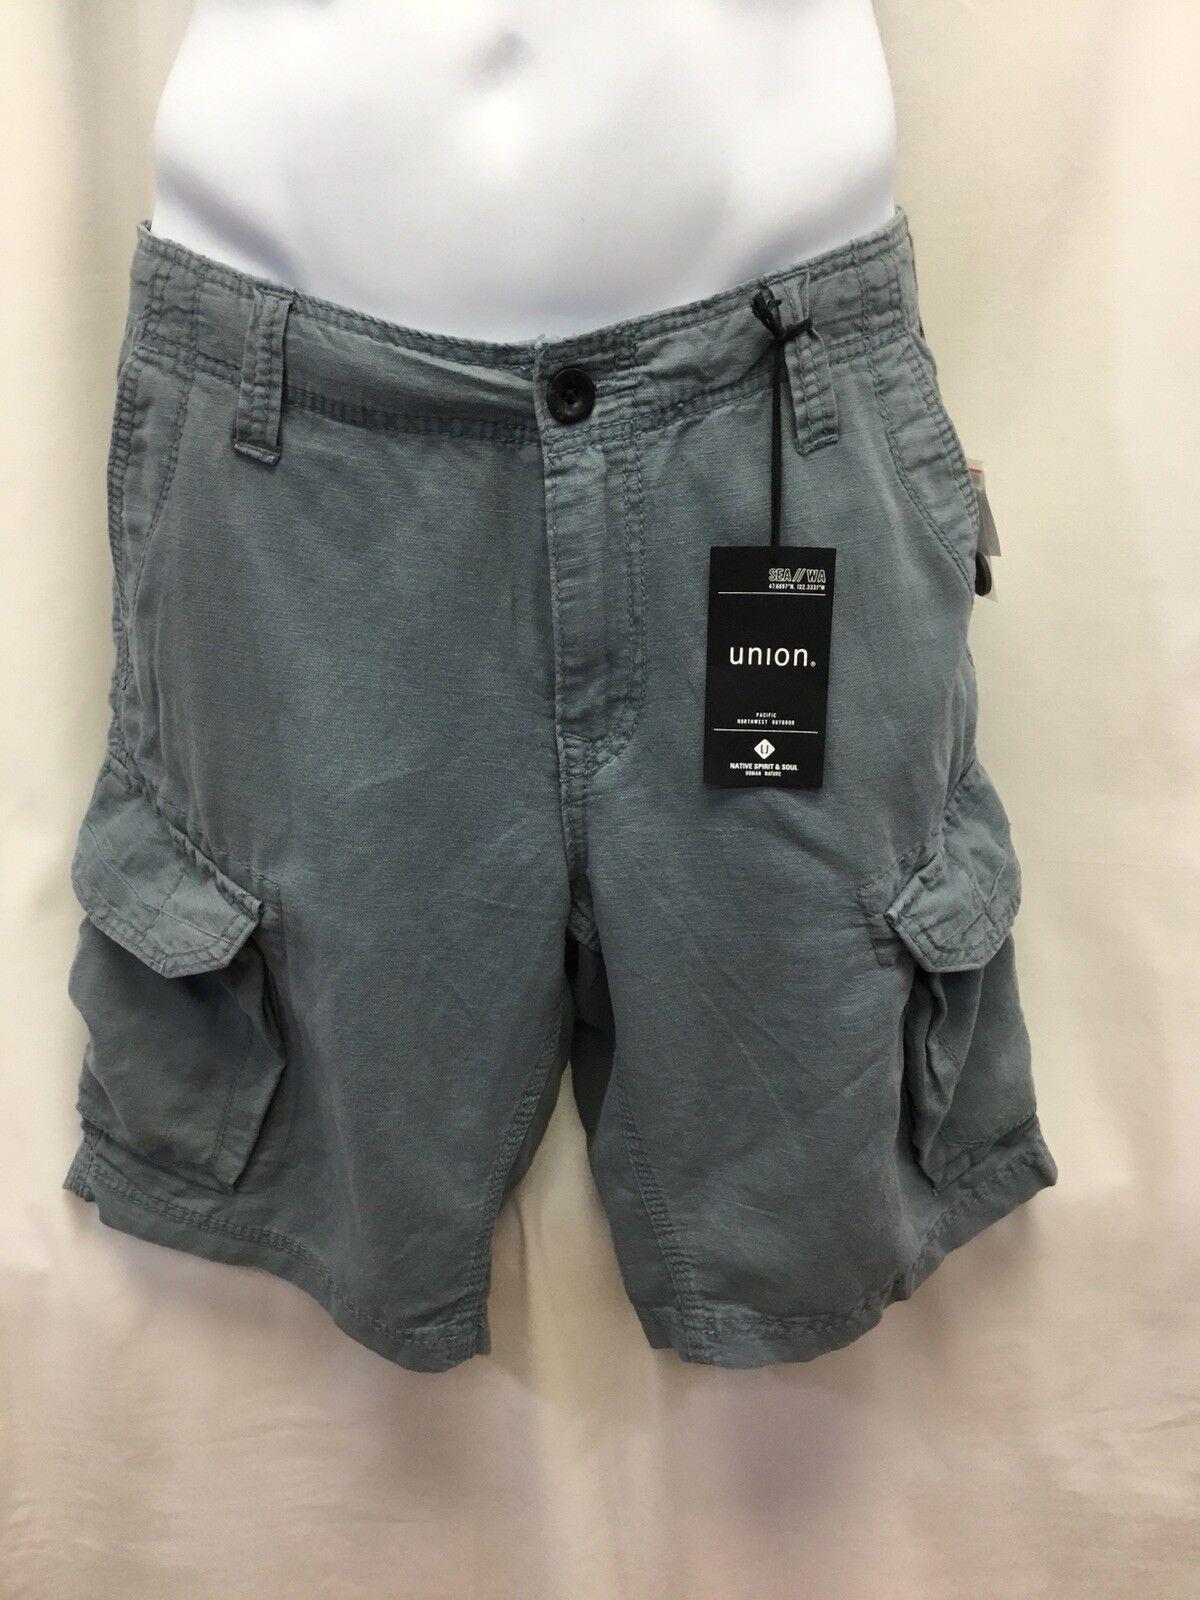 Union Denim Men's Crushin' It Cargo Shorts Gravity bluee